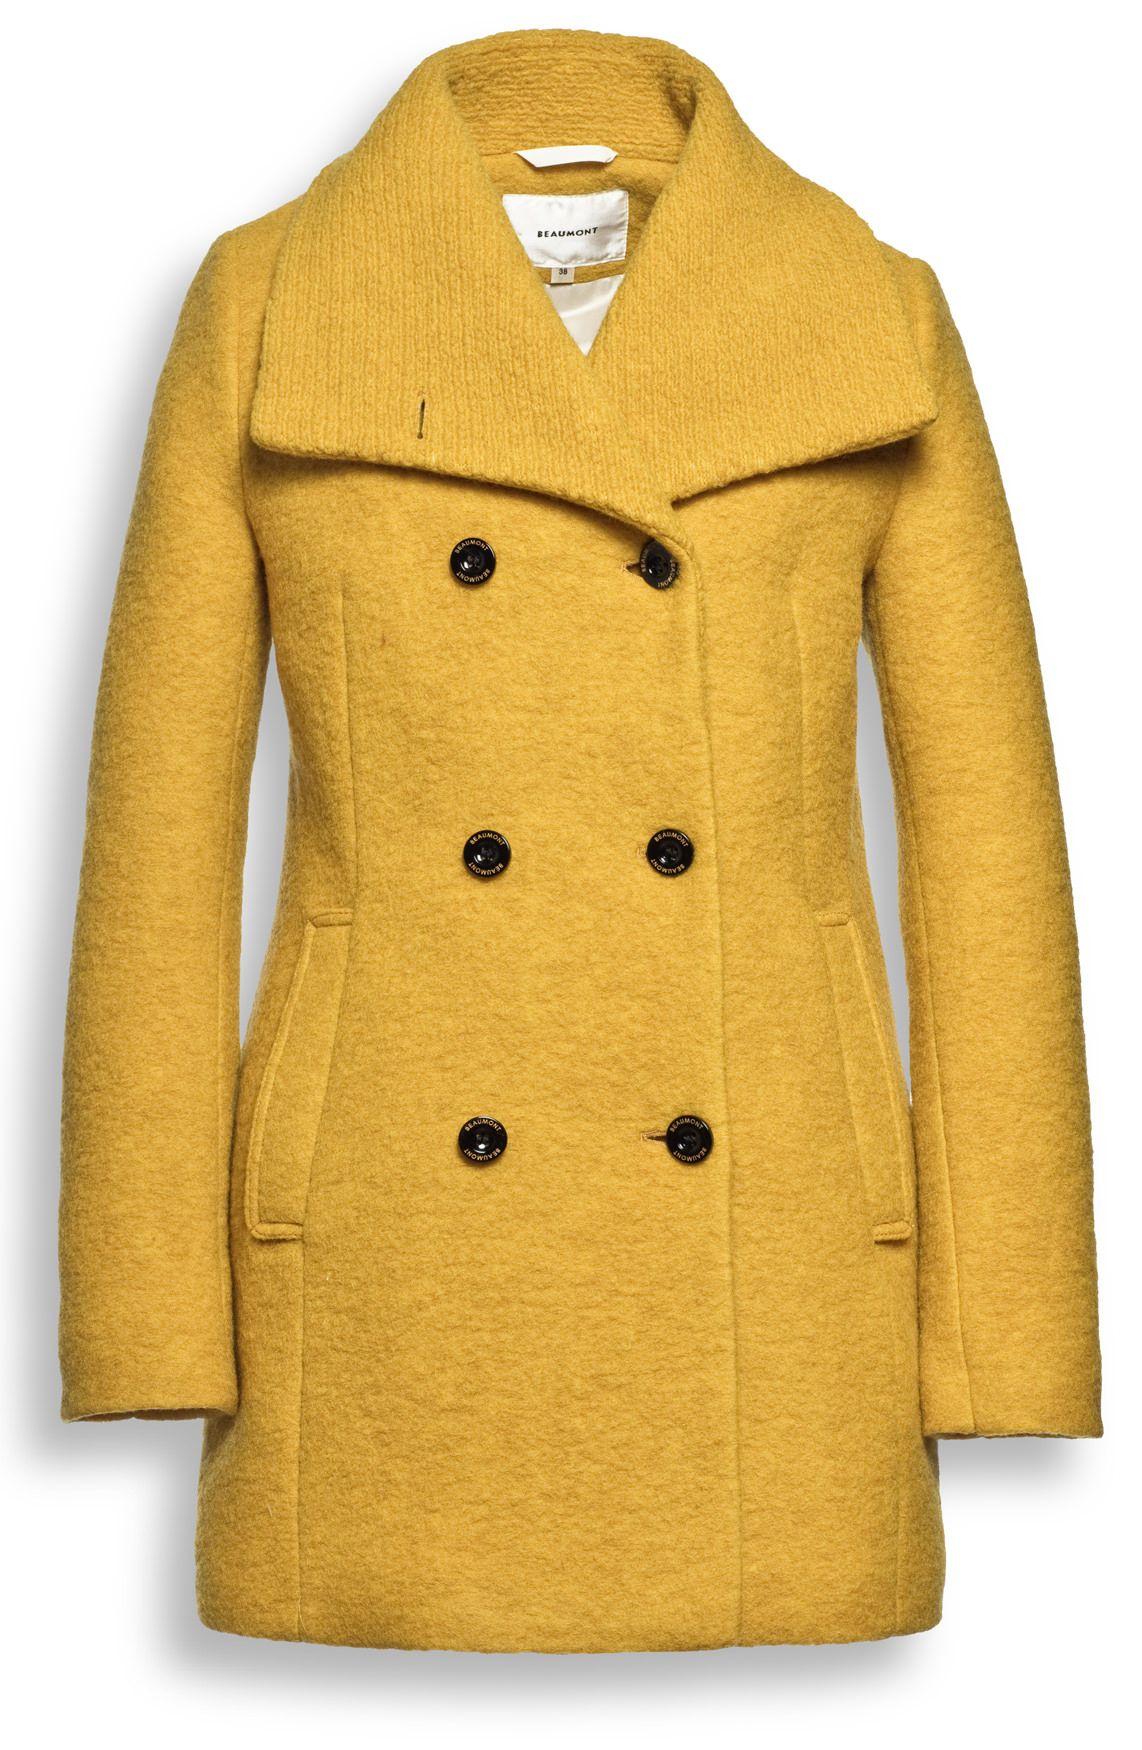 Wollen mantel   Mode Damesjassen, Jas en Kleding